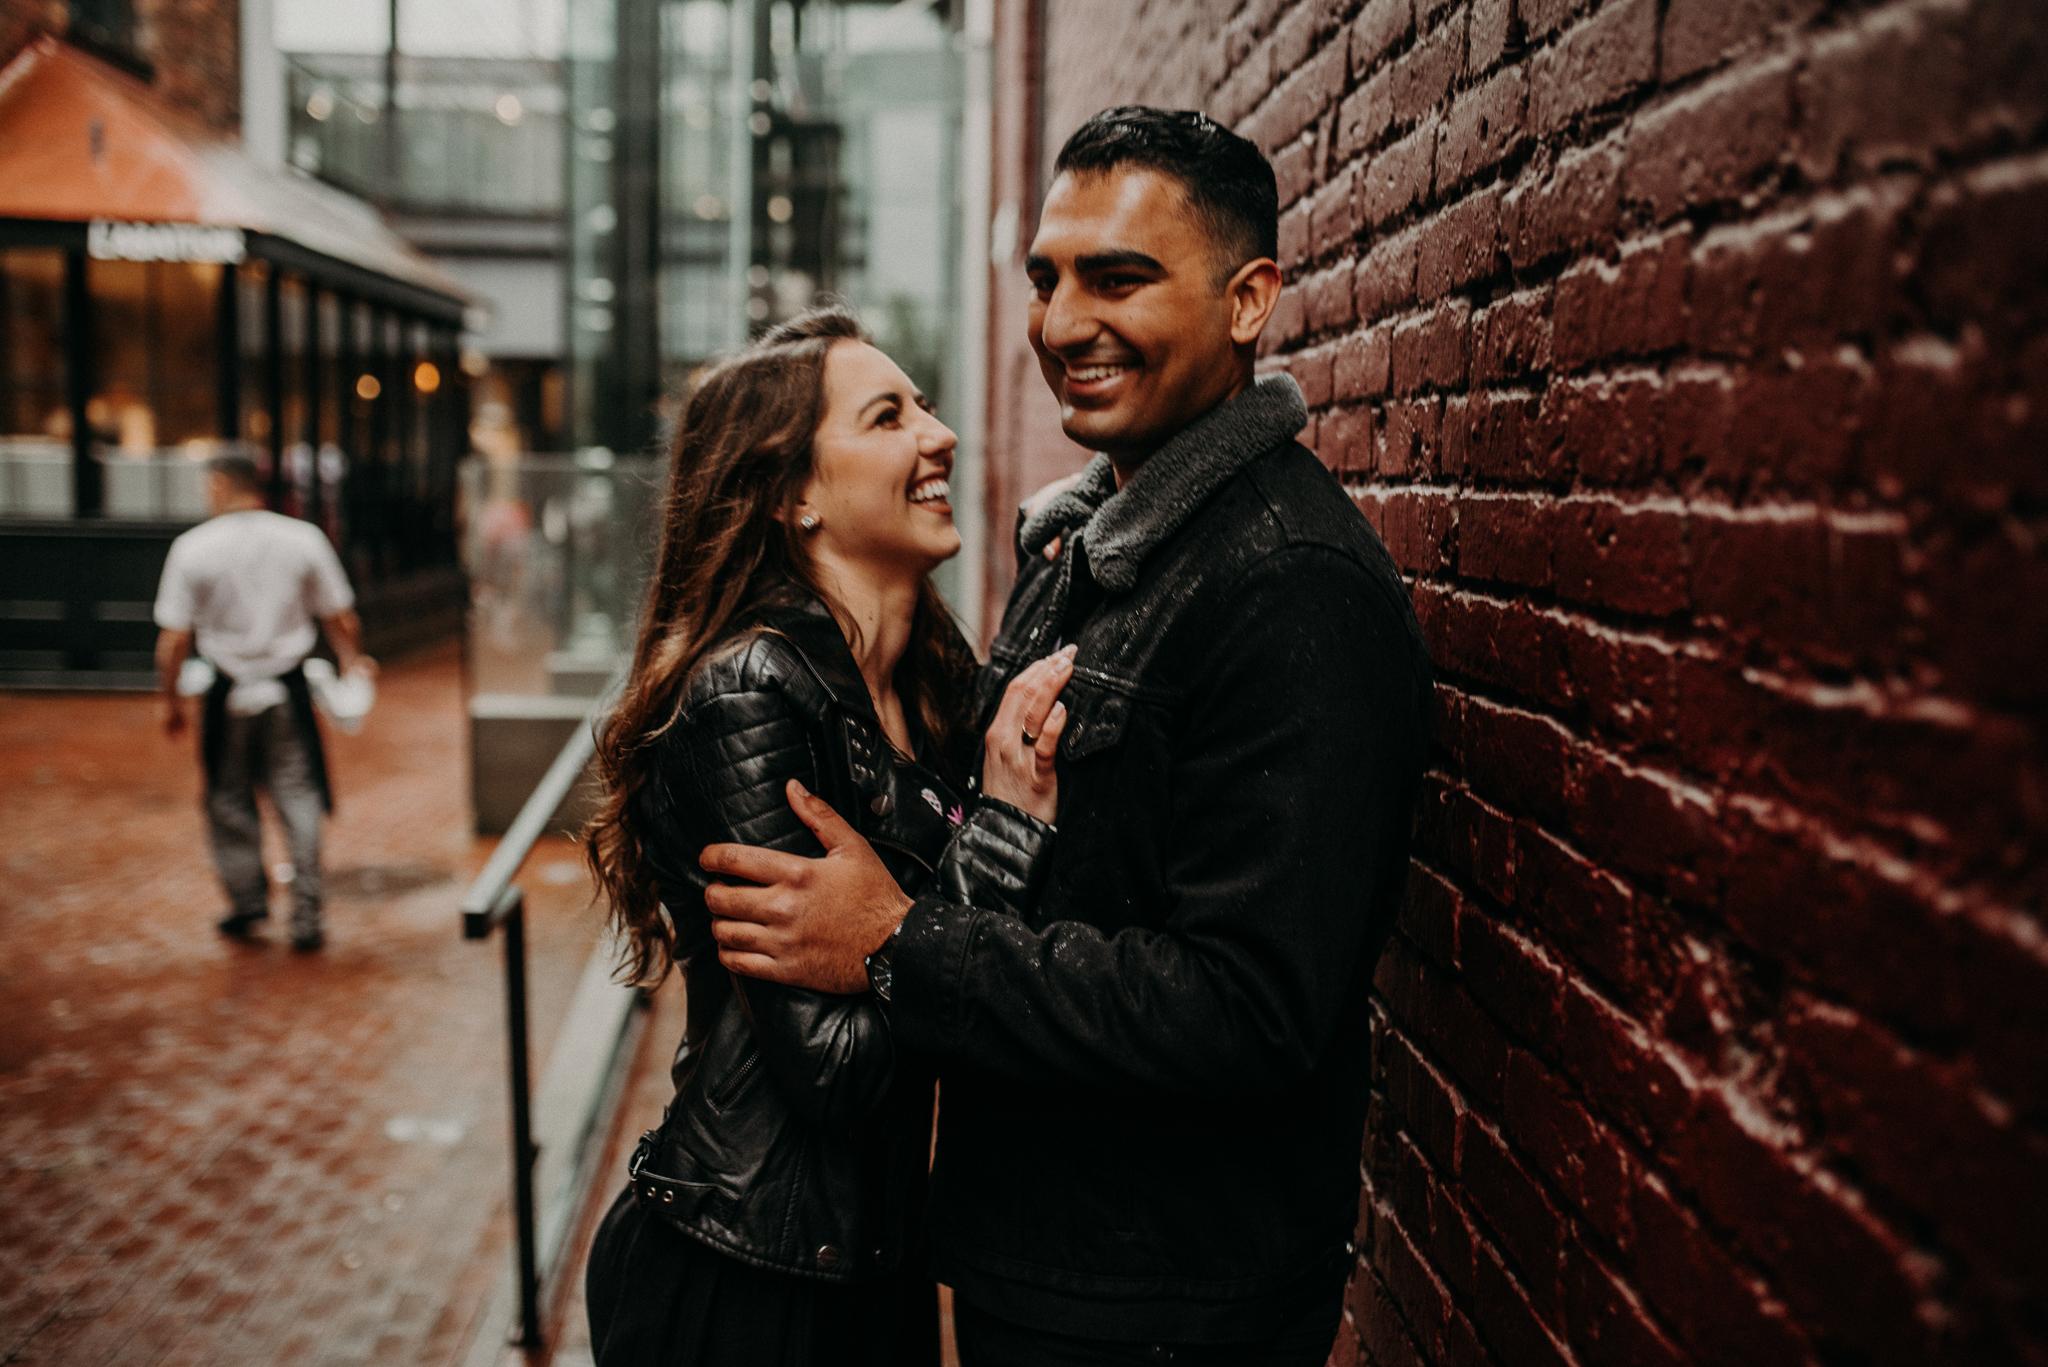 Maddie & Jas Gastown Vancouver Engagement Session - Laura Olson Photography - Sunshine Coast BC Photographer - Vancouver Photographer-2855.jpg